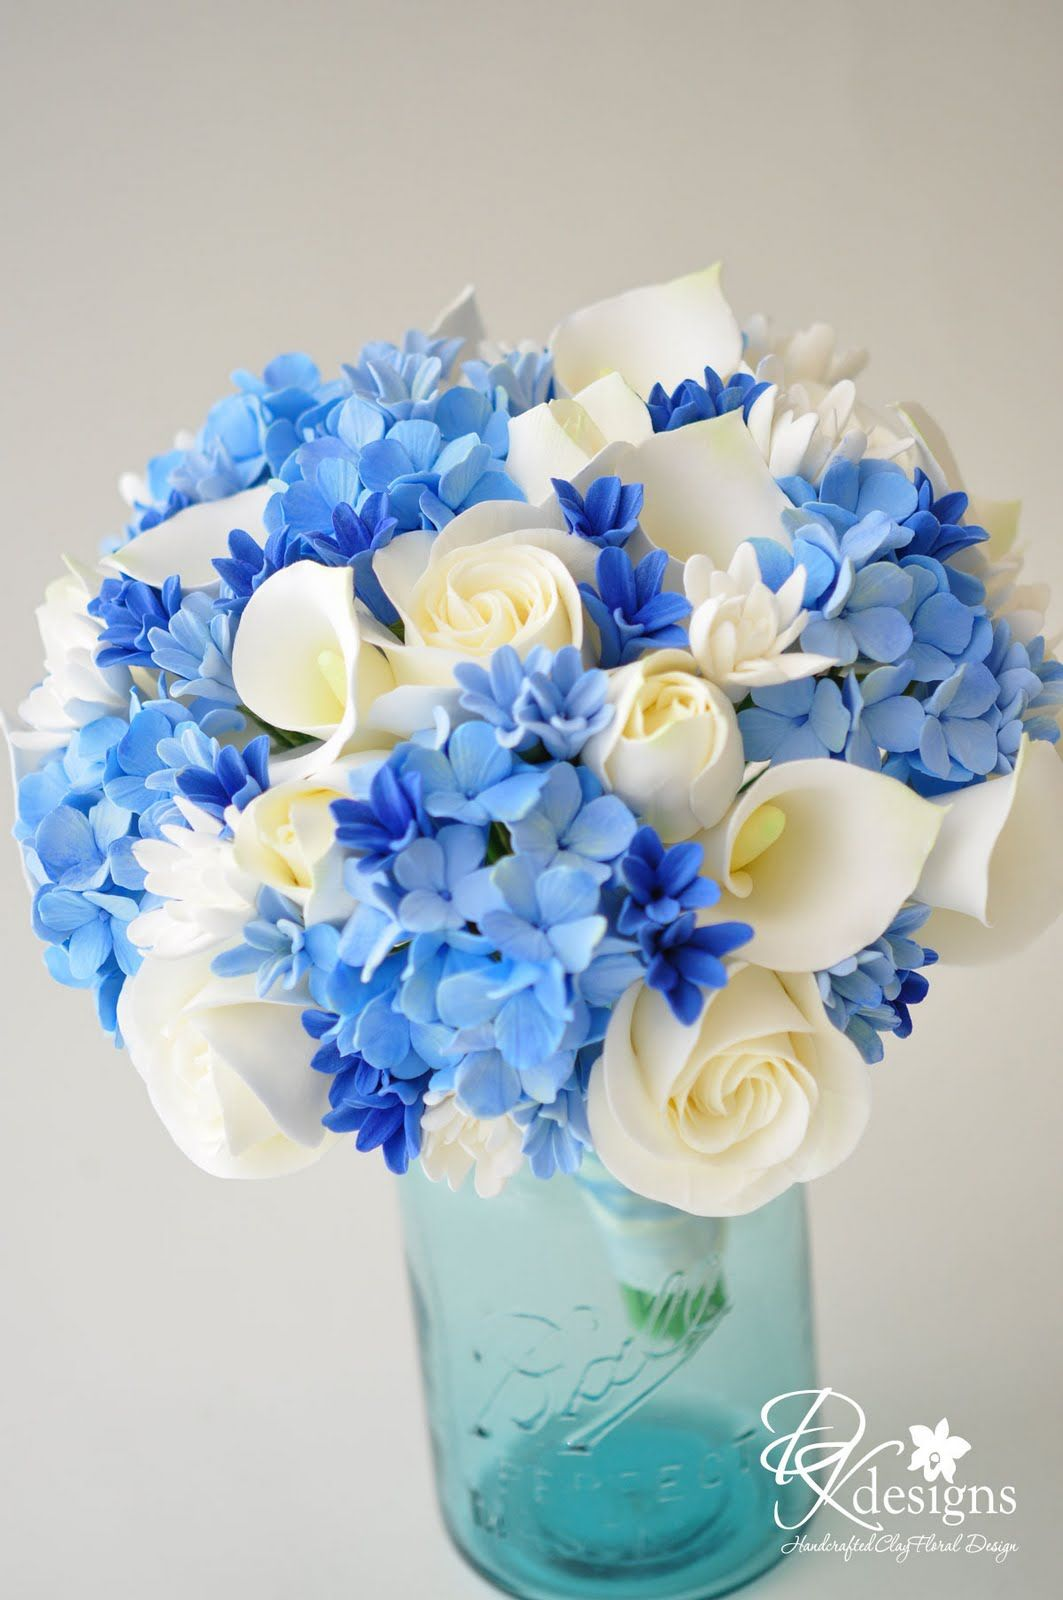 Dk designs something blueuquet boutonniere a special gift dk designs something blueuquet boutonniere a special gift izmirmasajfo Image collections